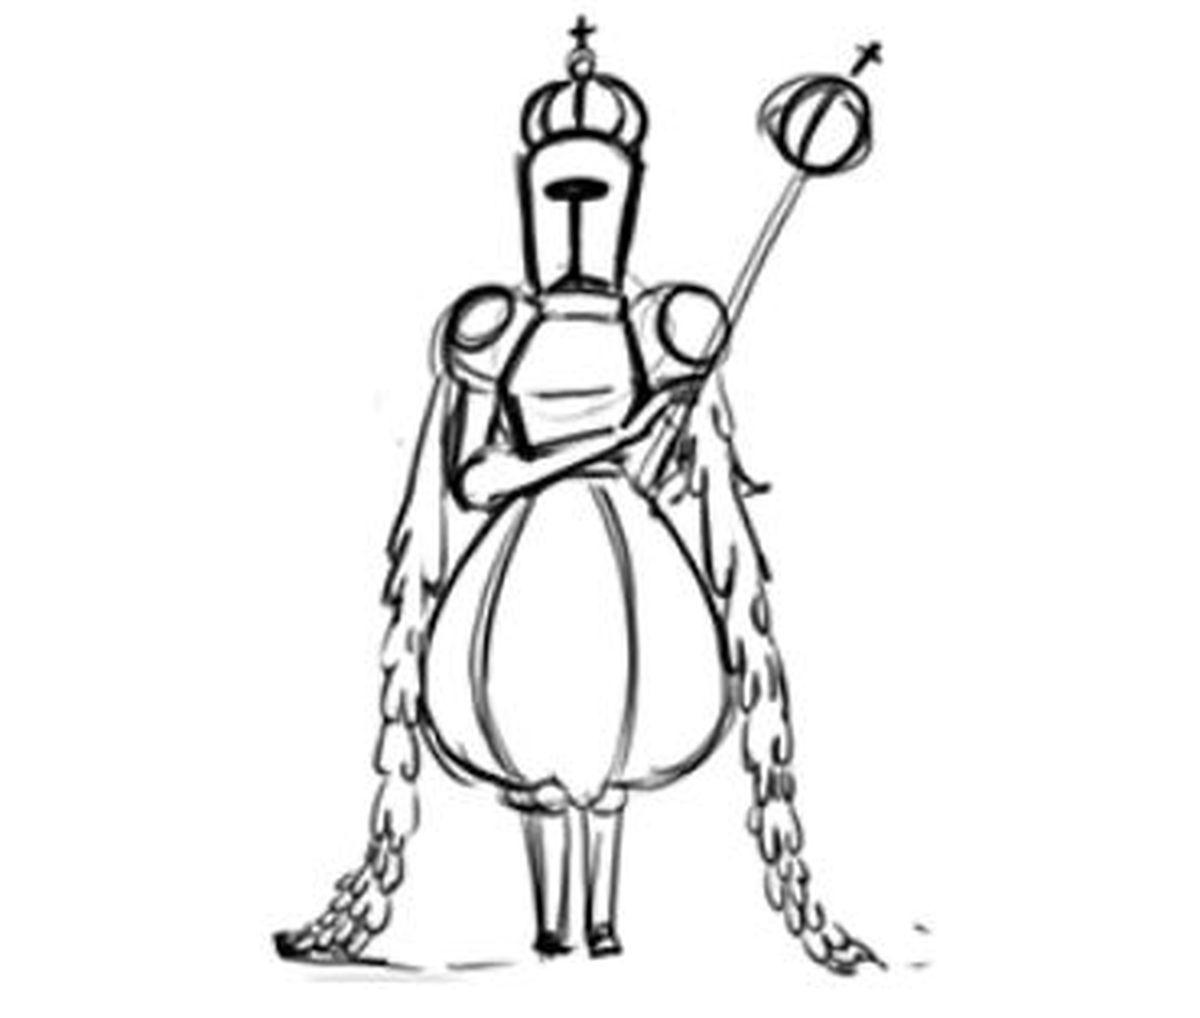 shovel knight rethinks gender in retro games with body